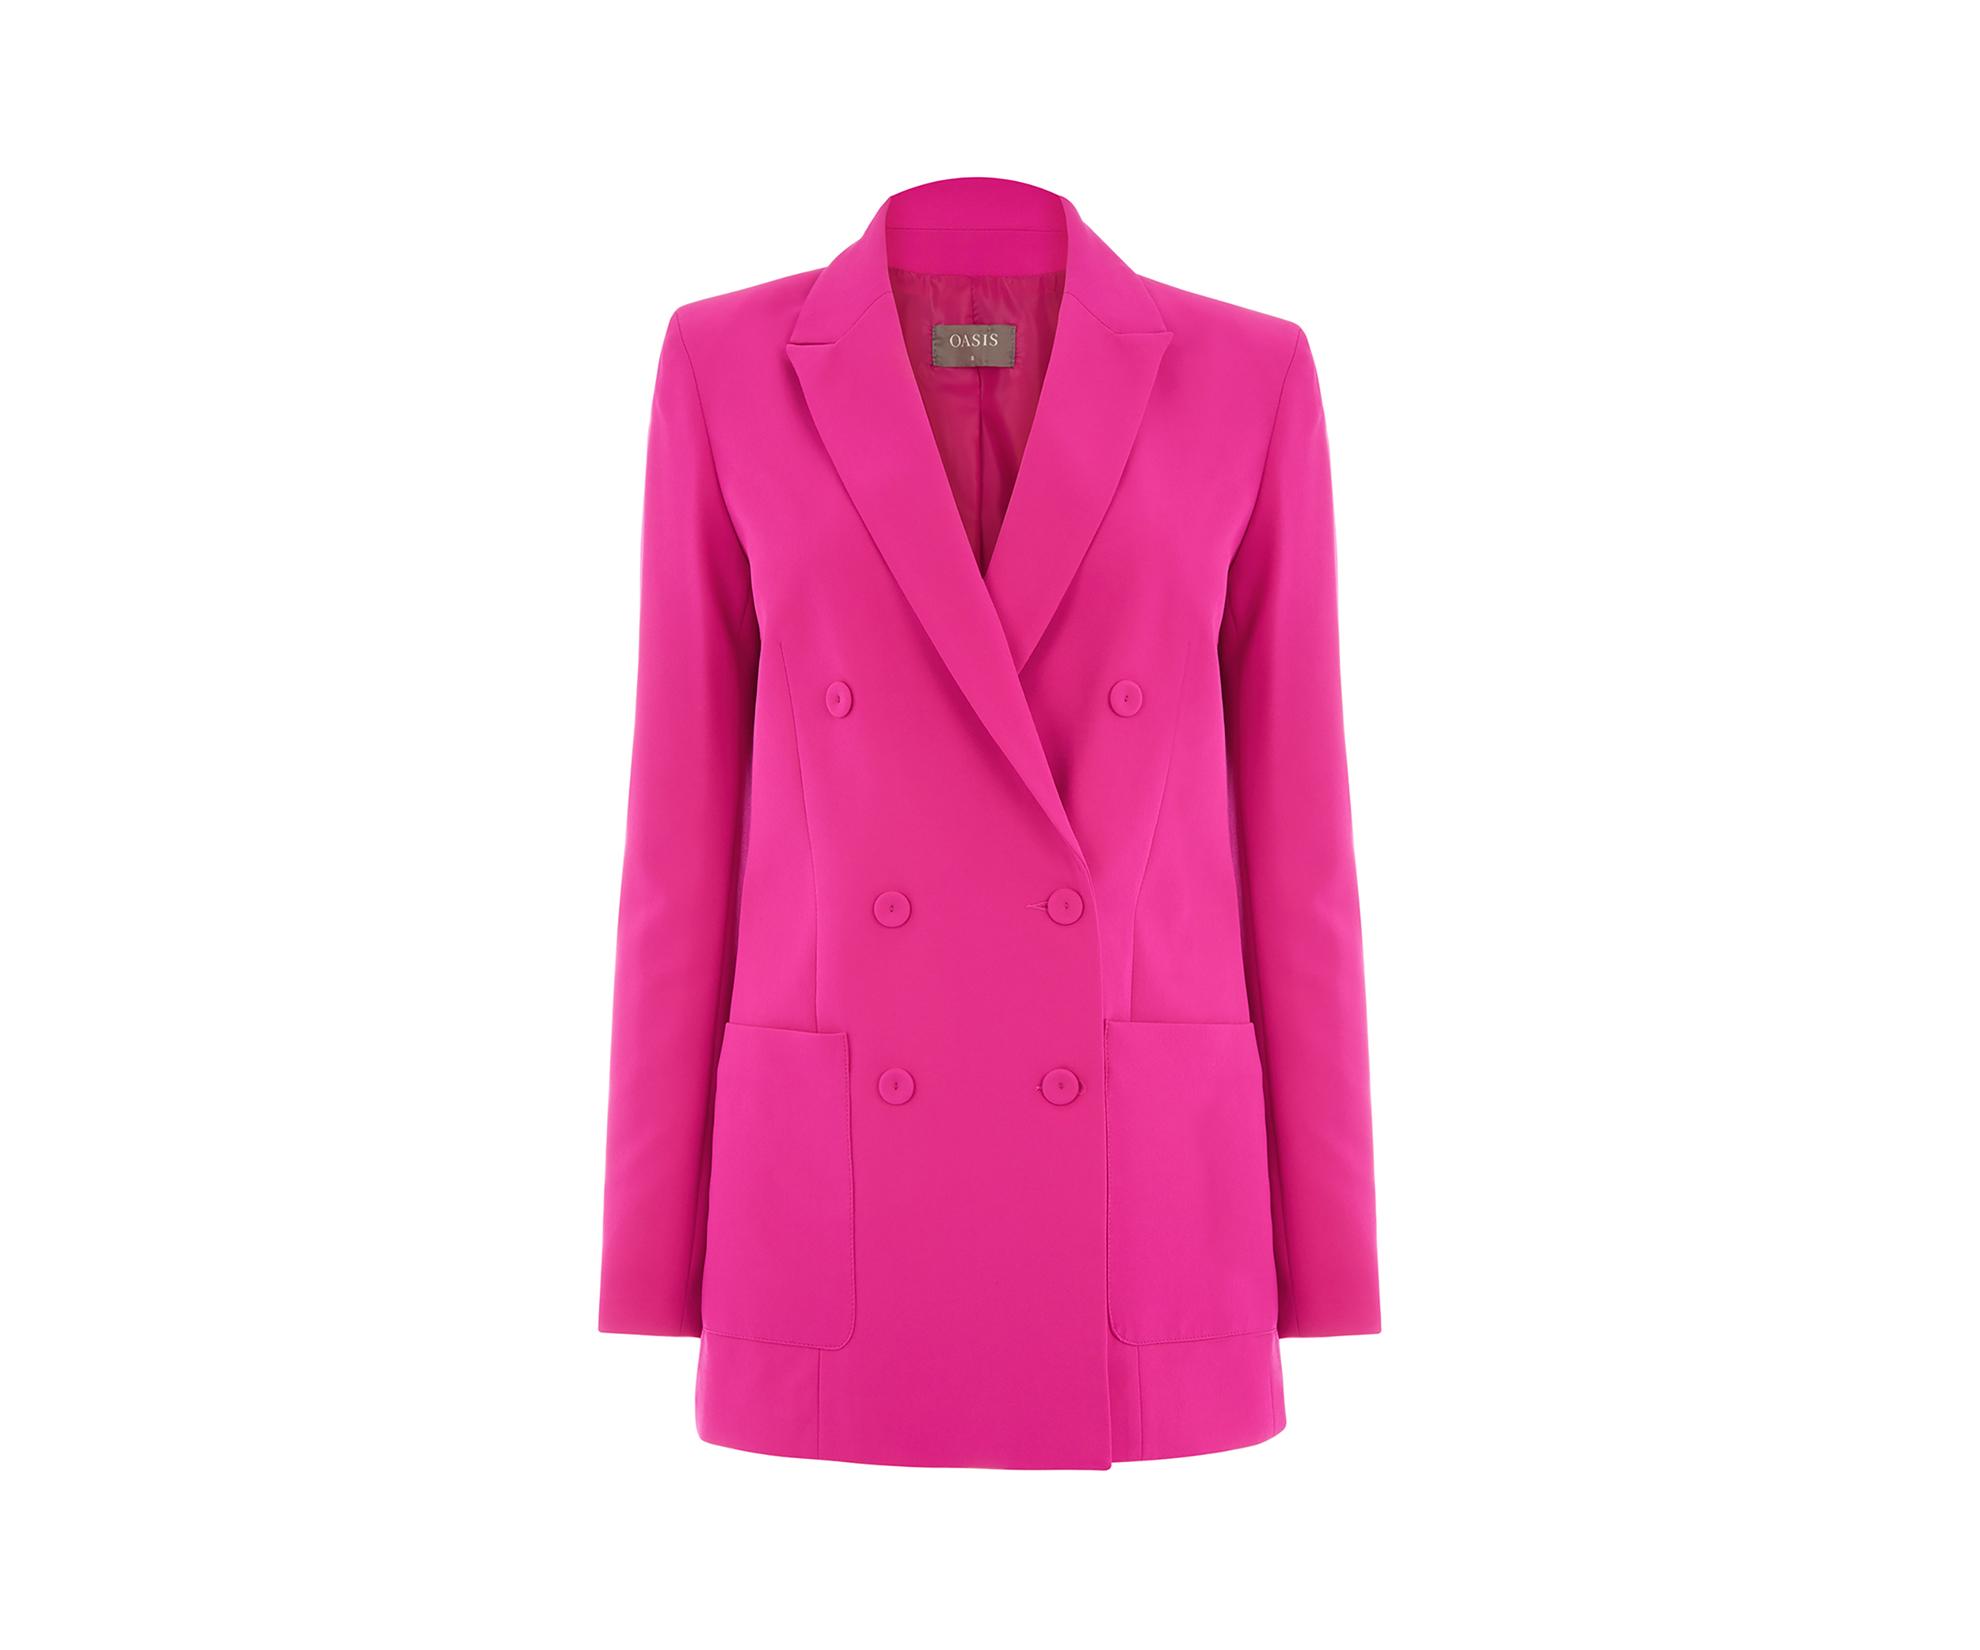 17-07-18-oasis_colour-pop-jacket.jpg#asset:518606